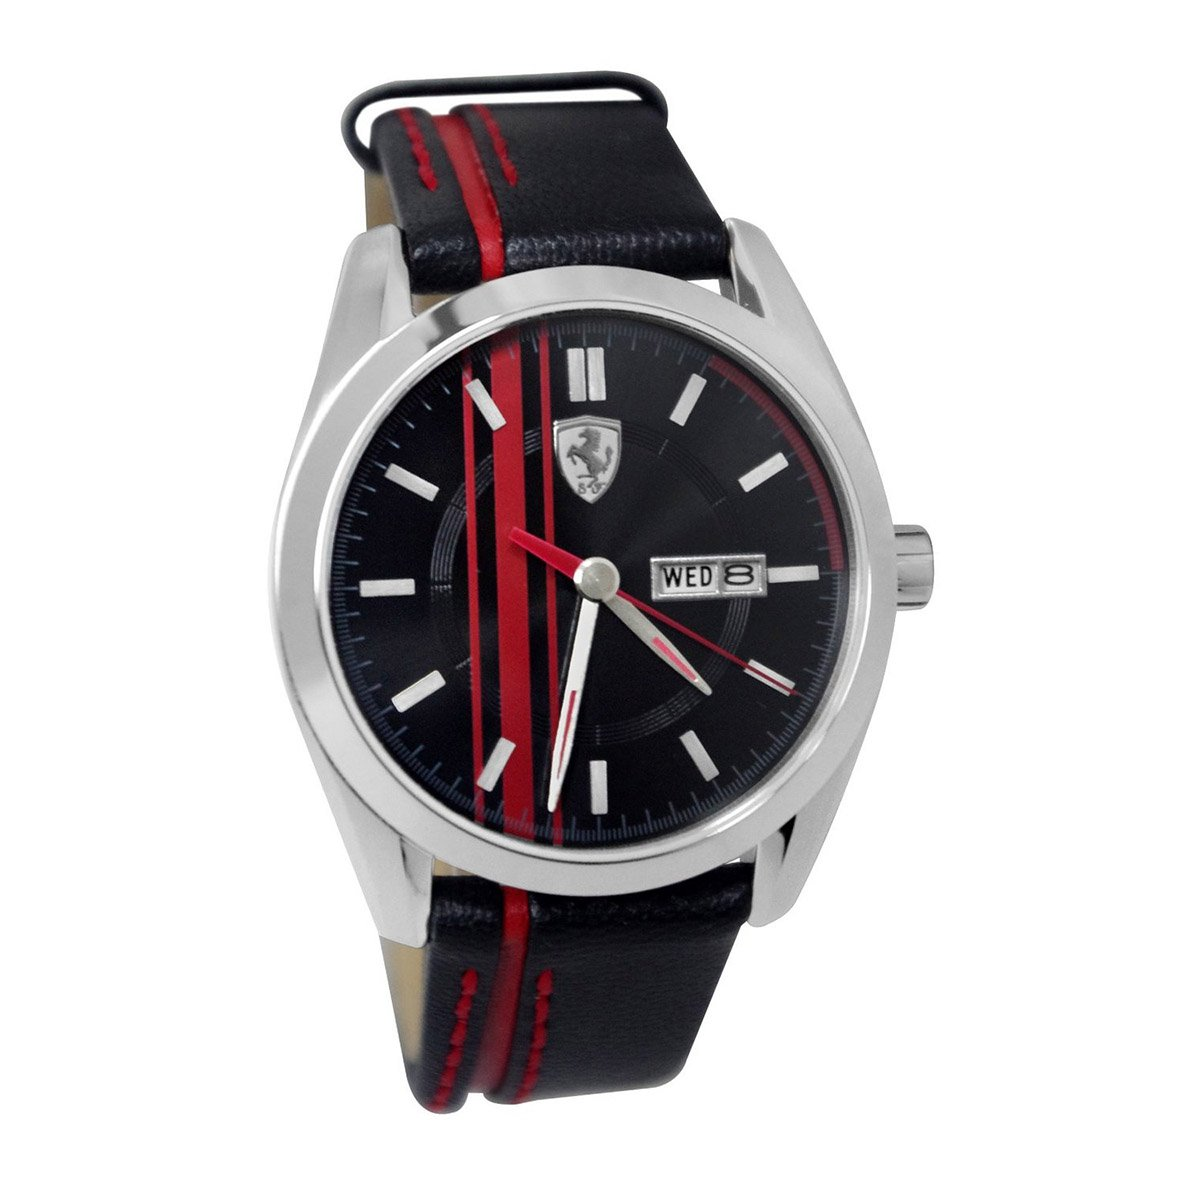 Ferrari 0870005 Scuderia Black Red Dial Leather Watch & Key Chain Gift Set NEW